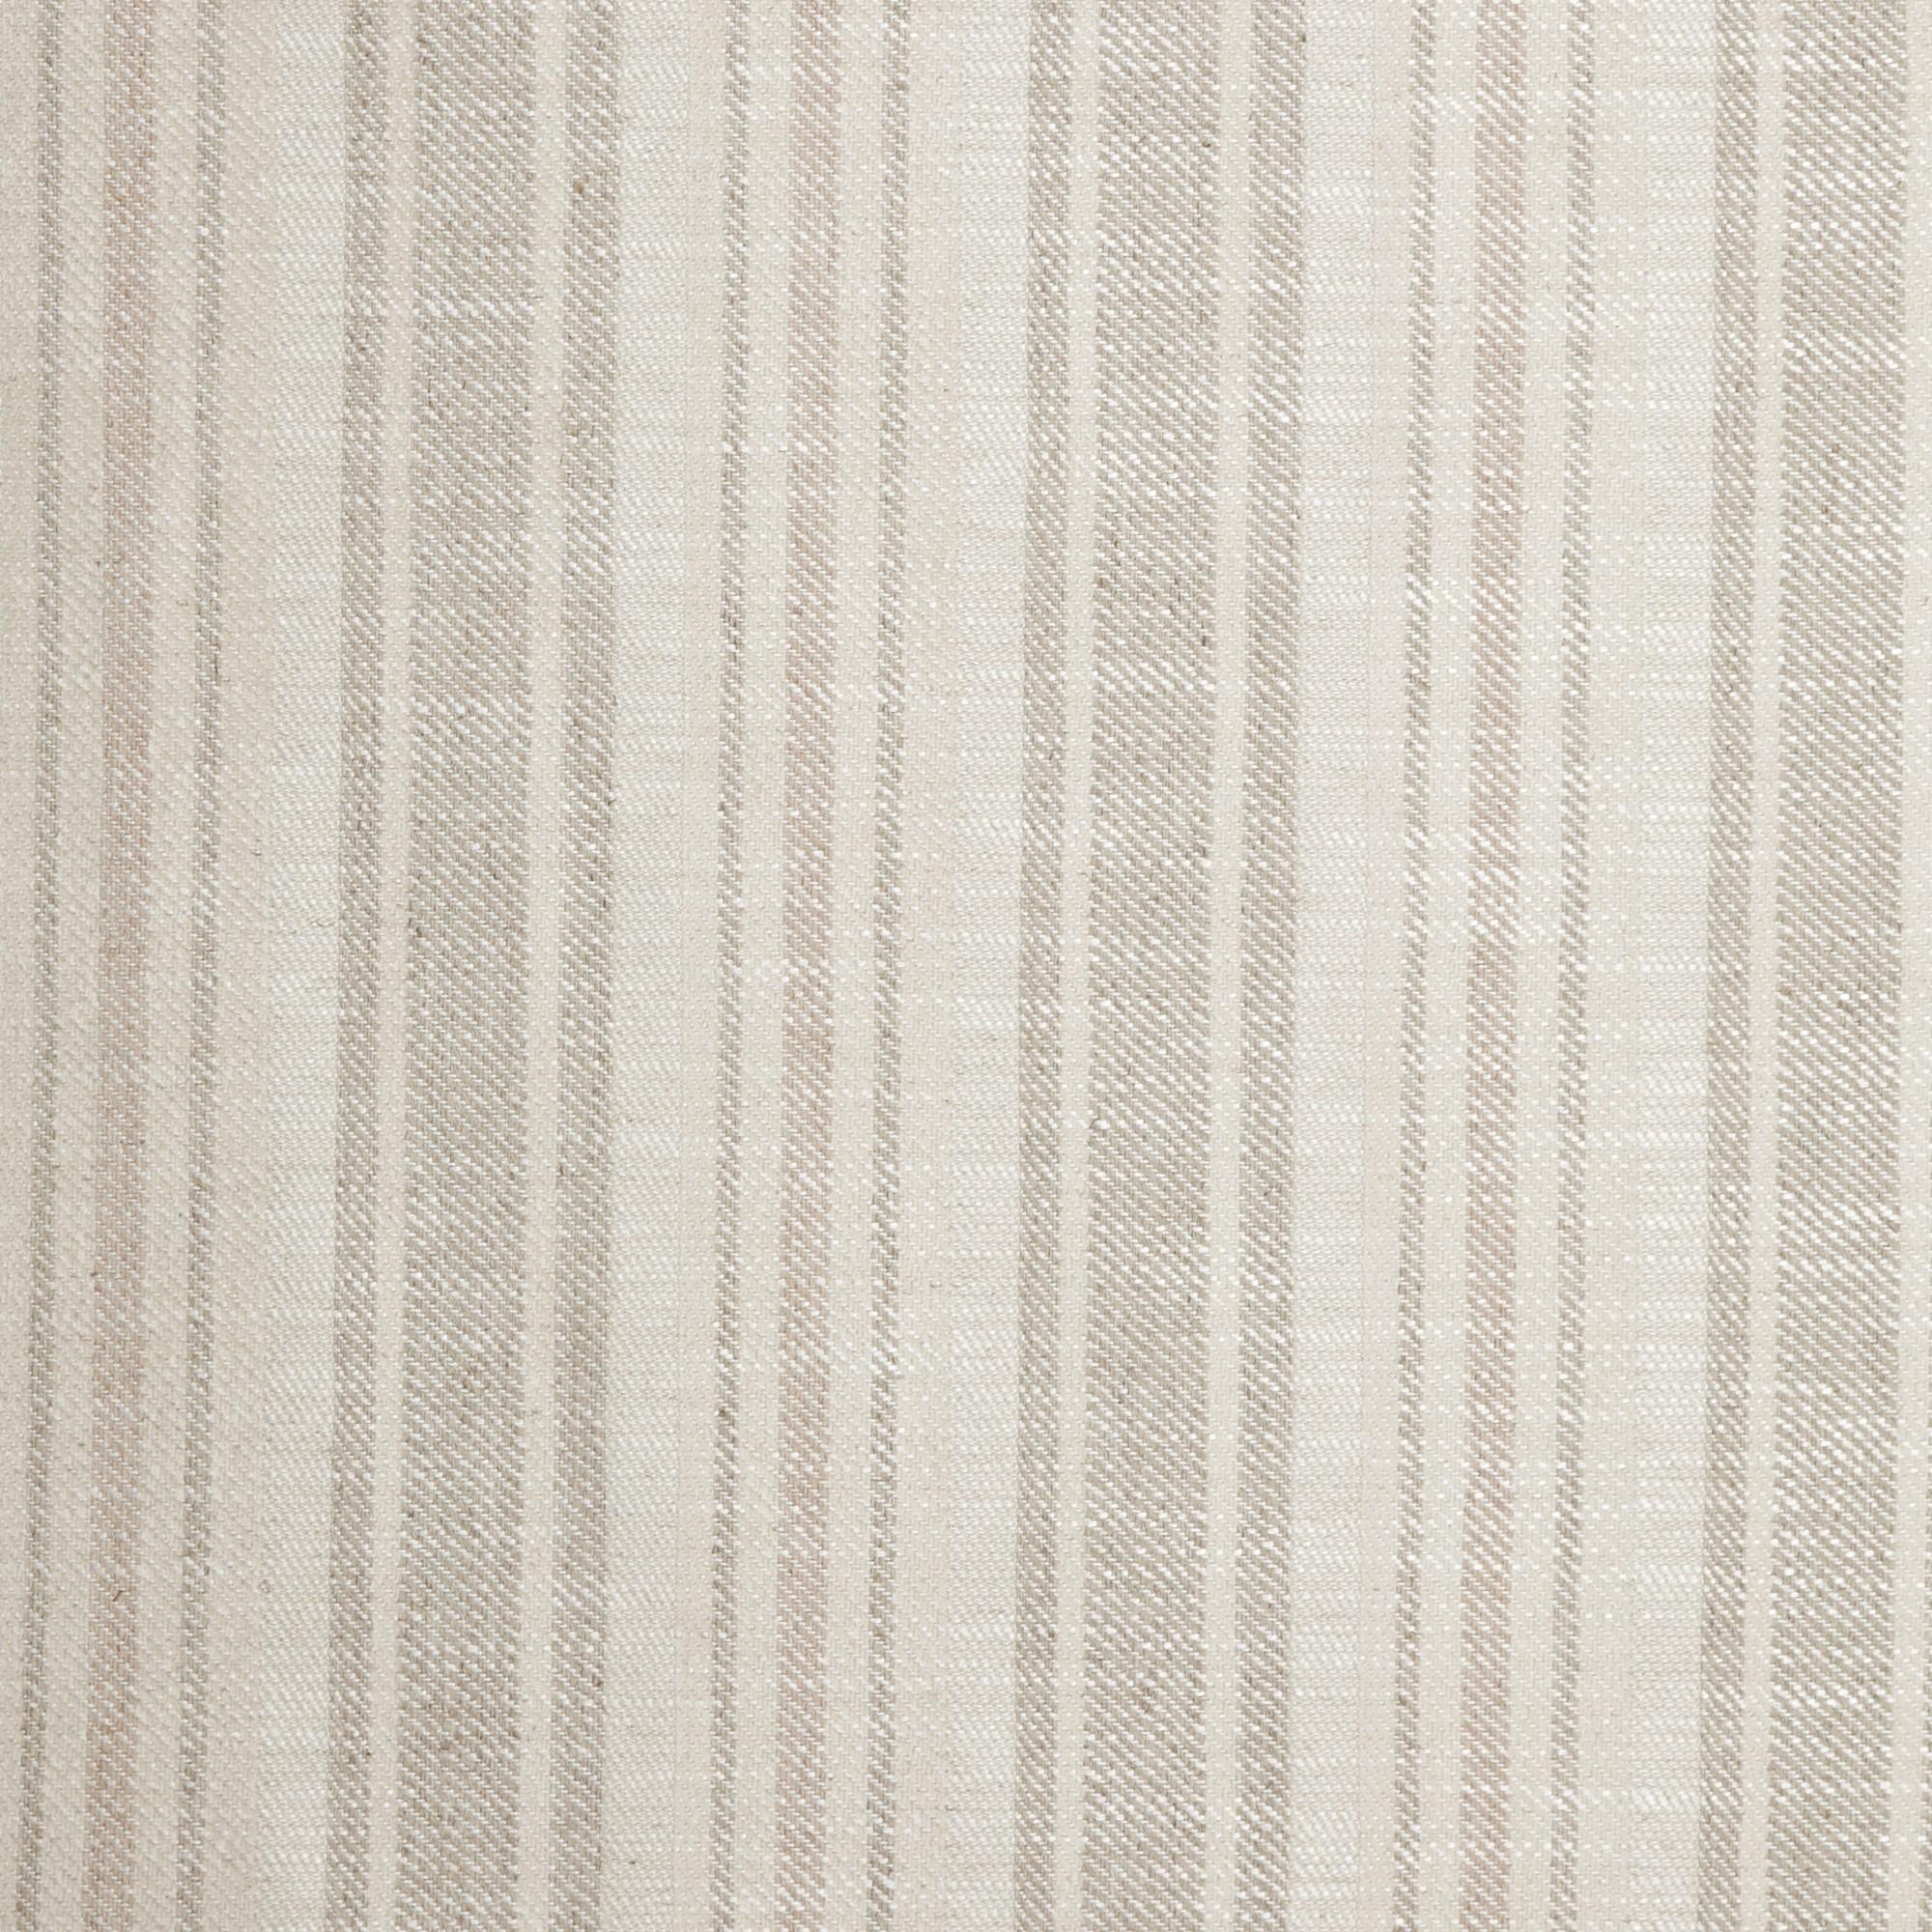 John Lewis Leckford Woven Jacquard Fabric